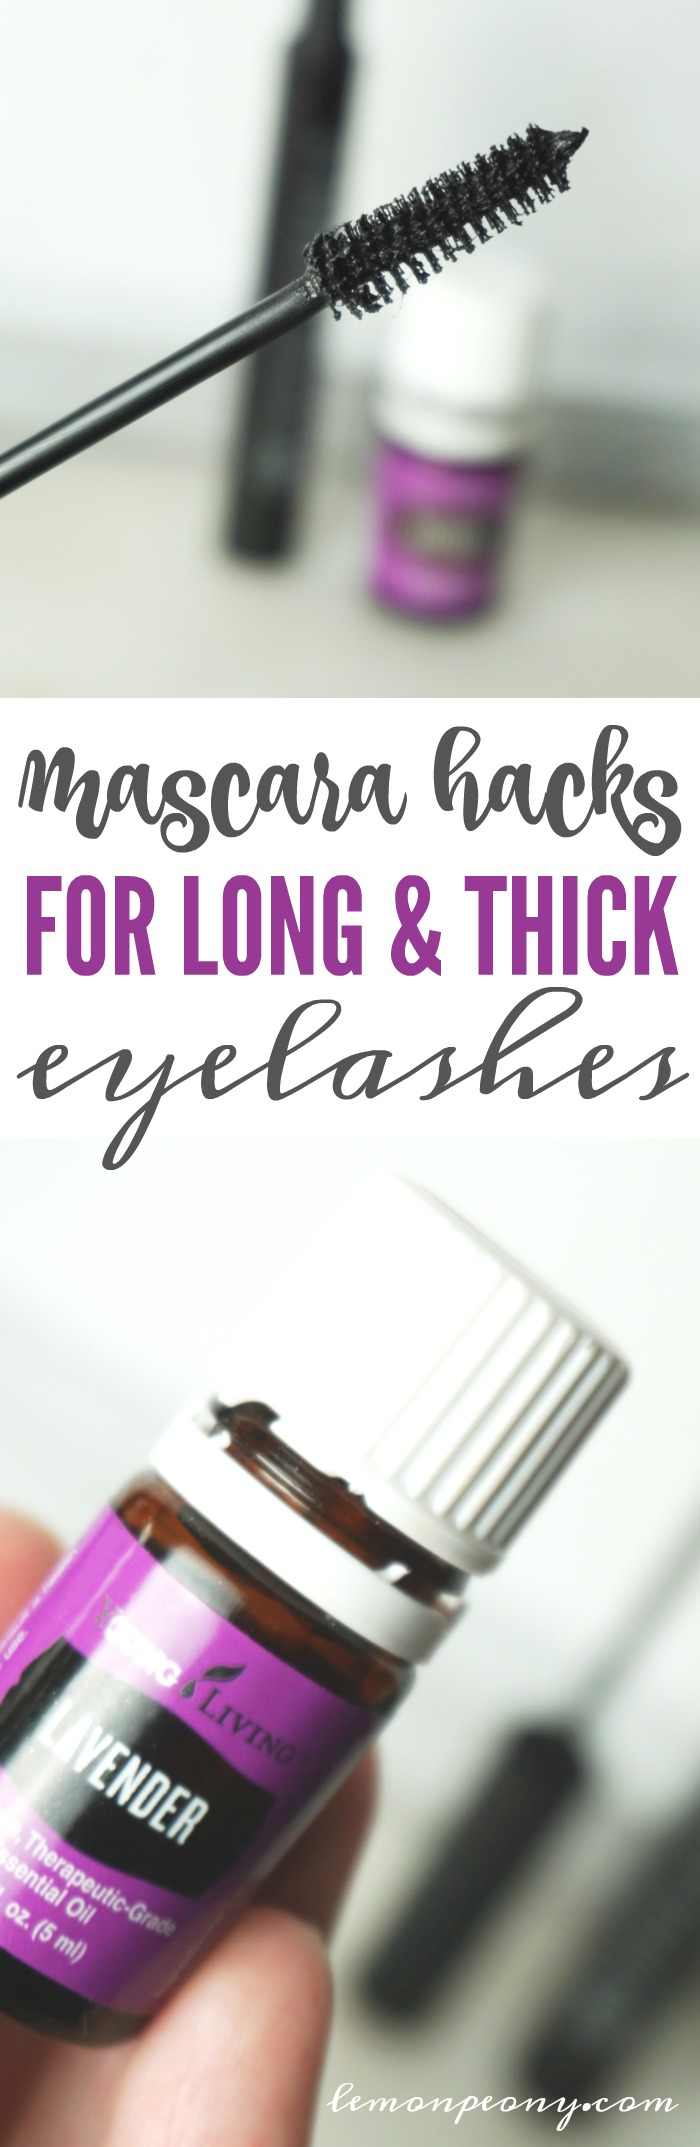 Mascara Hacks for Long and Thick Eyelashes